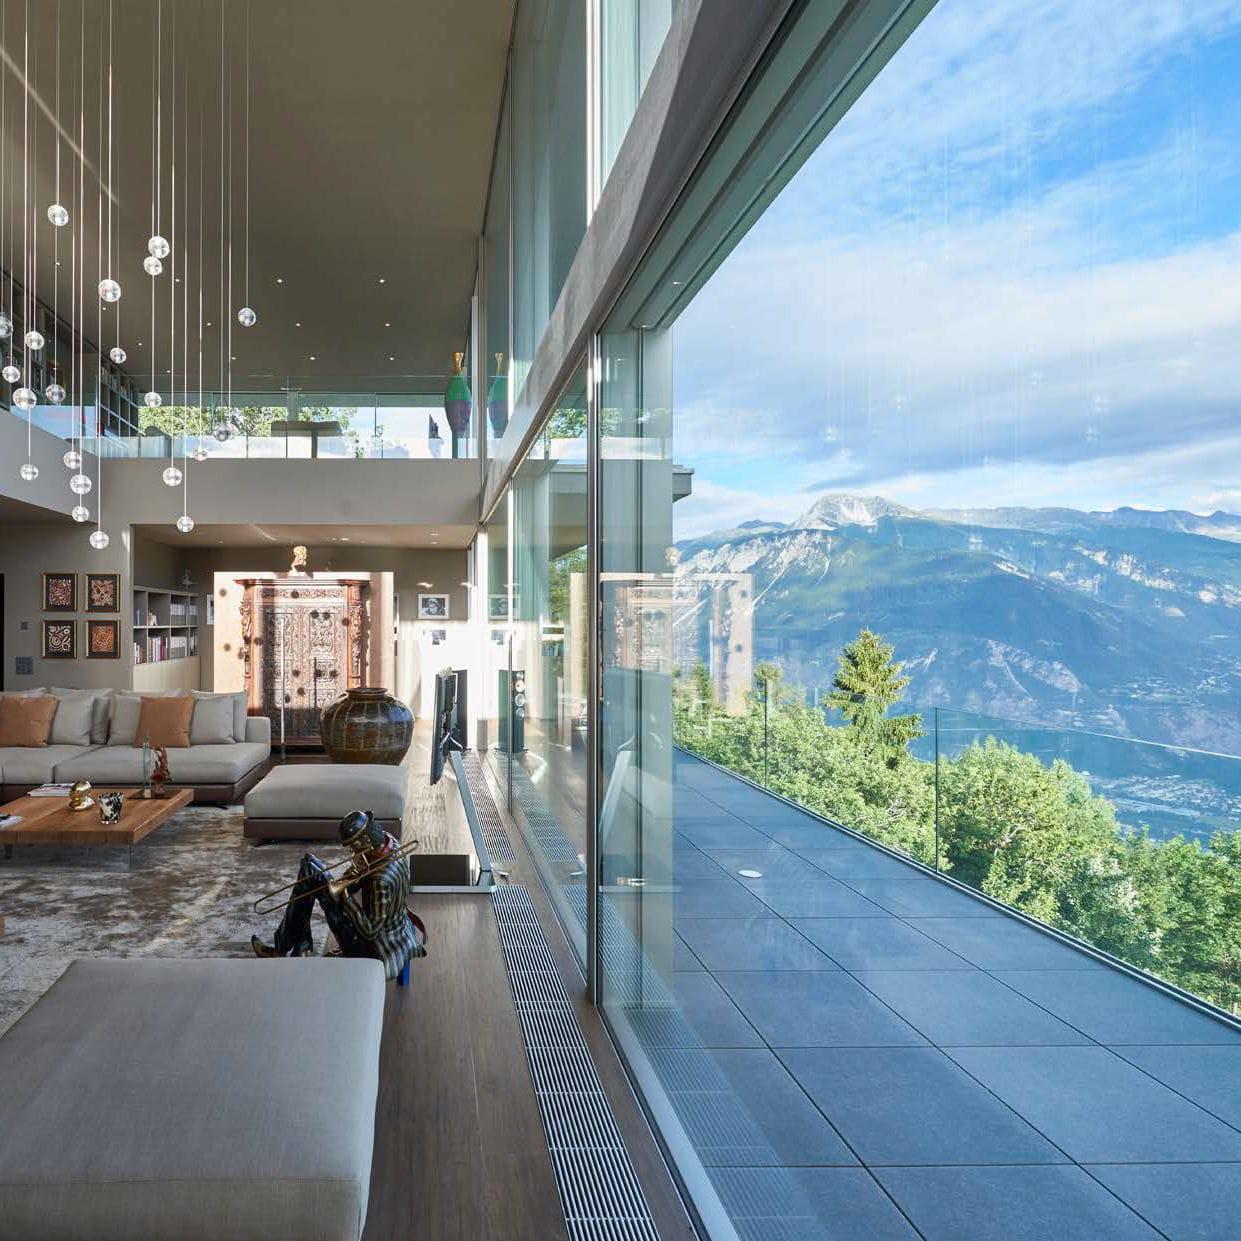 Sliding Patio Door / Triple Glazed / Insulated   MINIMAL WINDOWS®4+